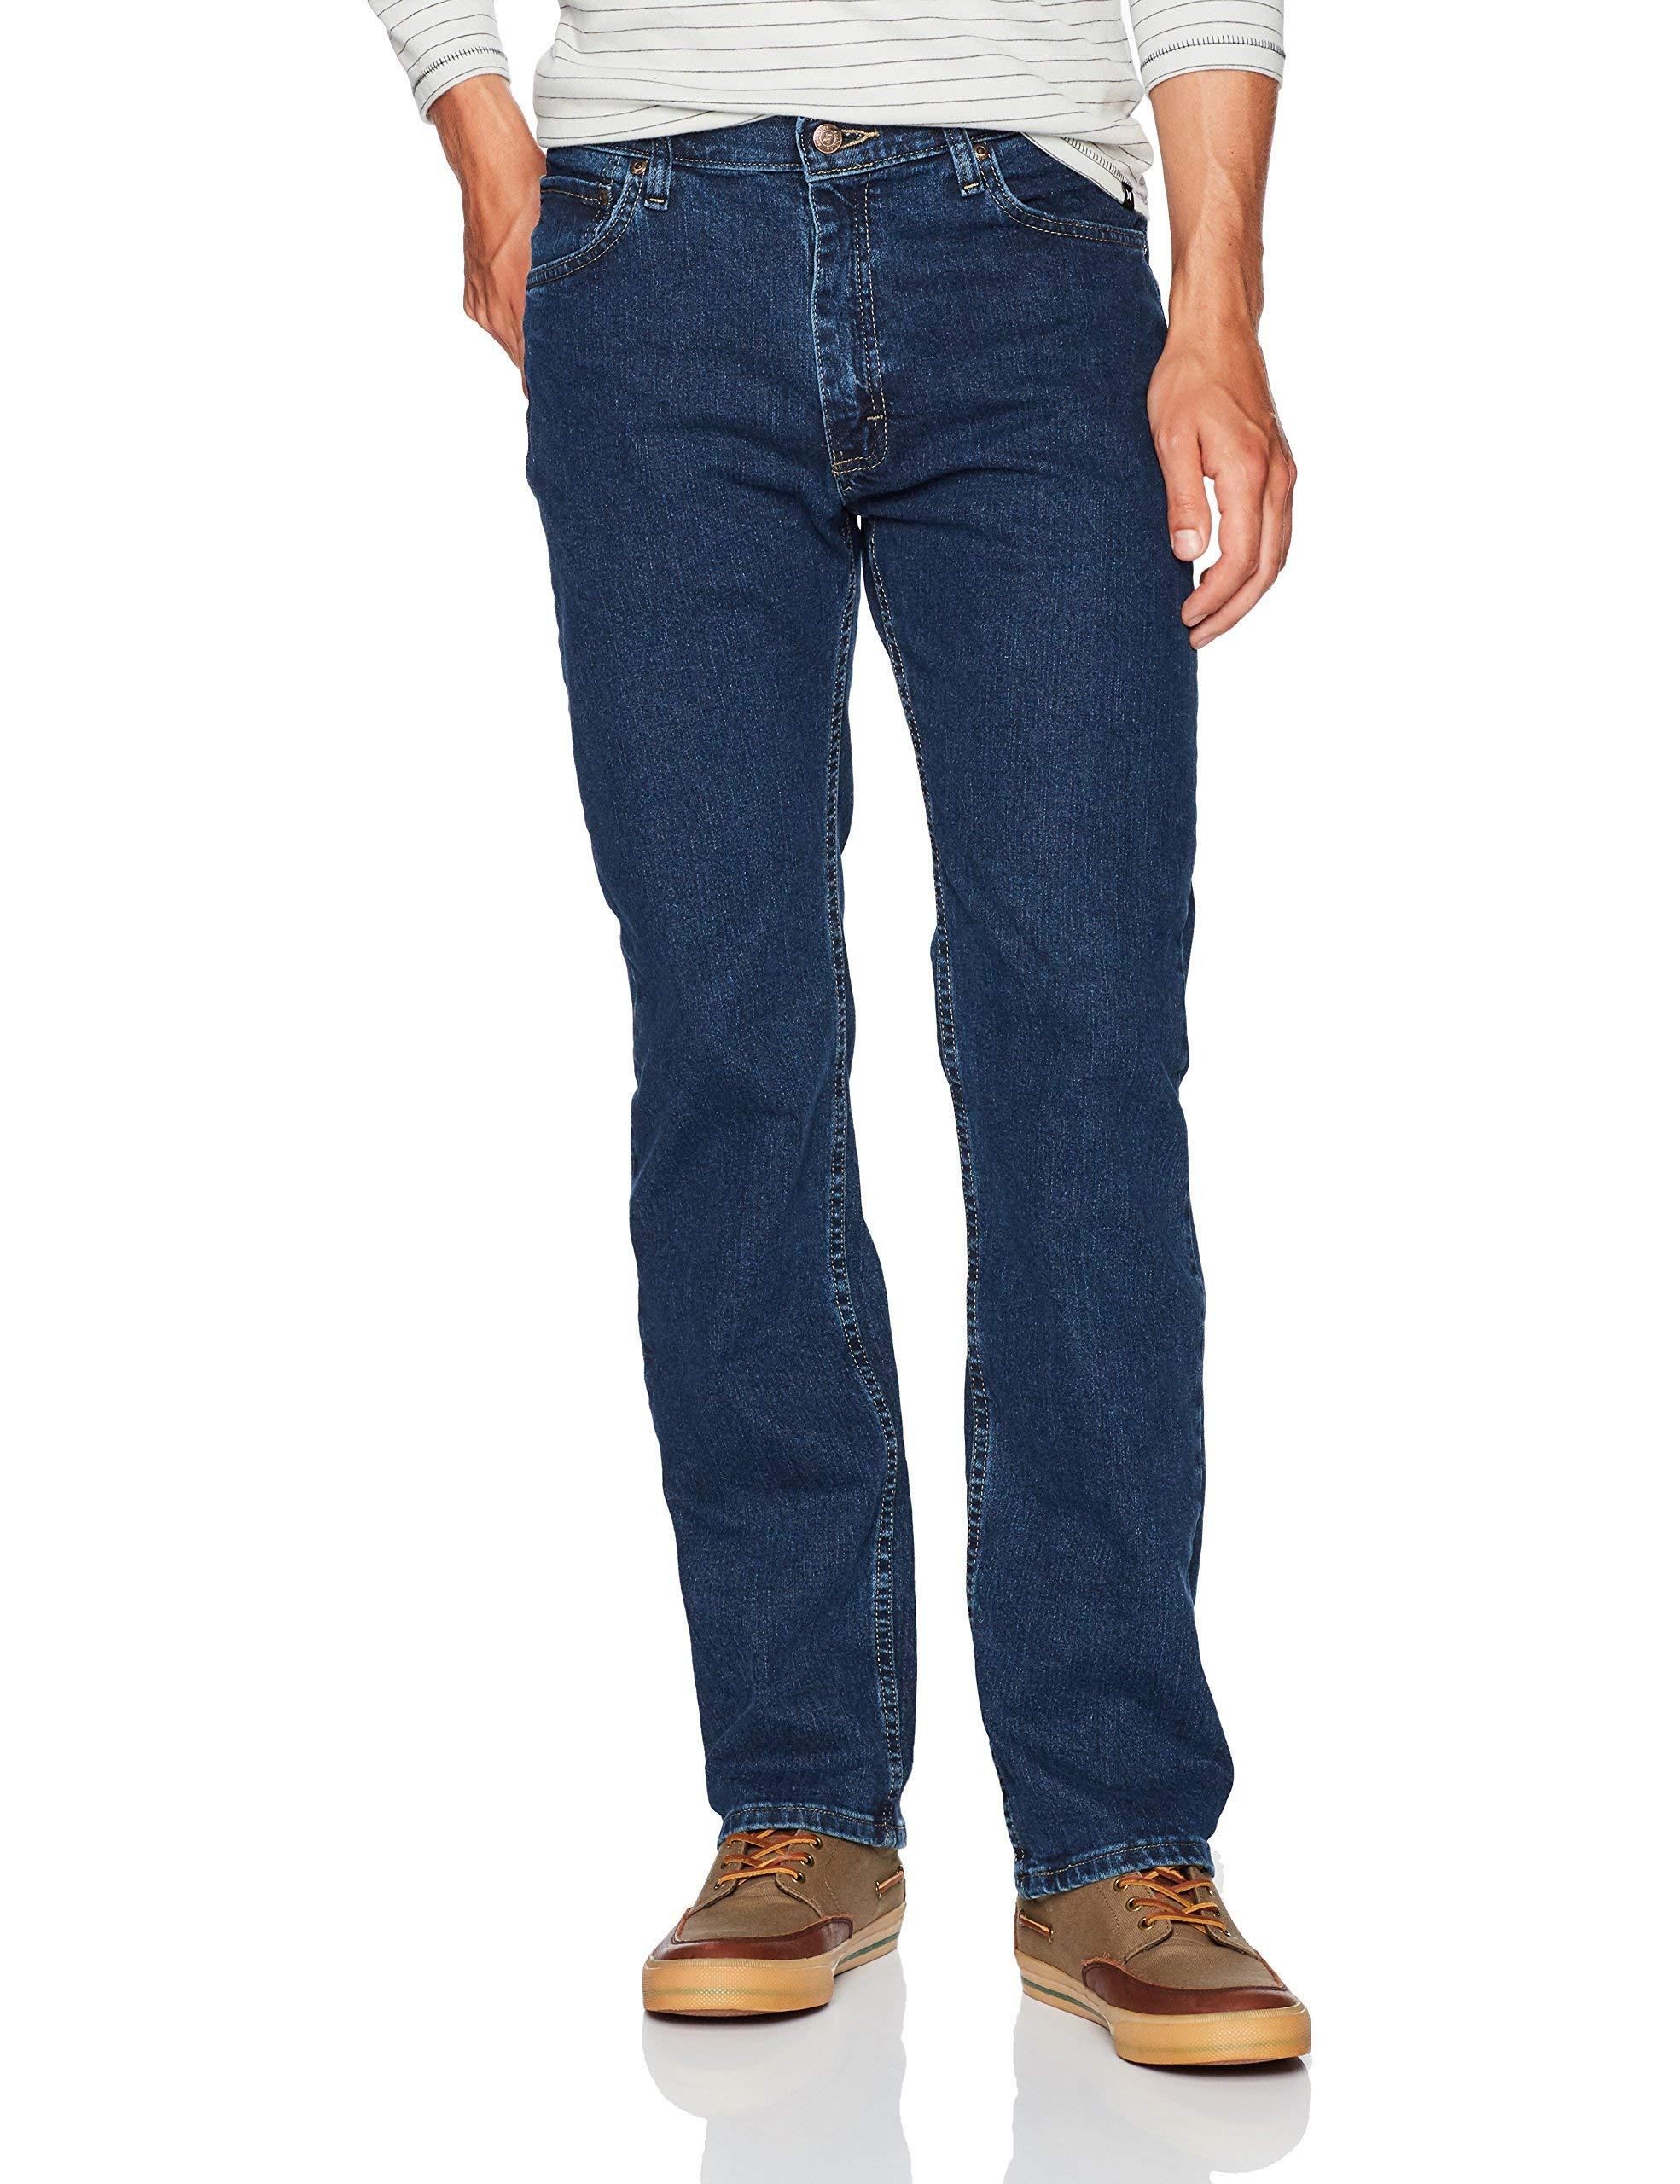 Wrangler Men's Regular Fit Comfort Flex Waist Jean, Dark Stonewash, 38X29 by Wrangler